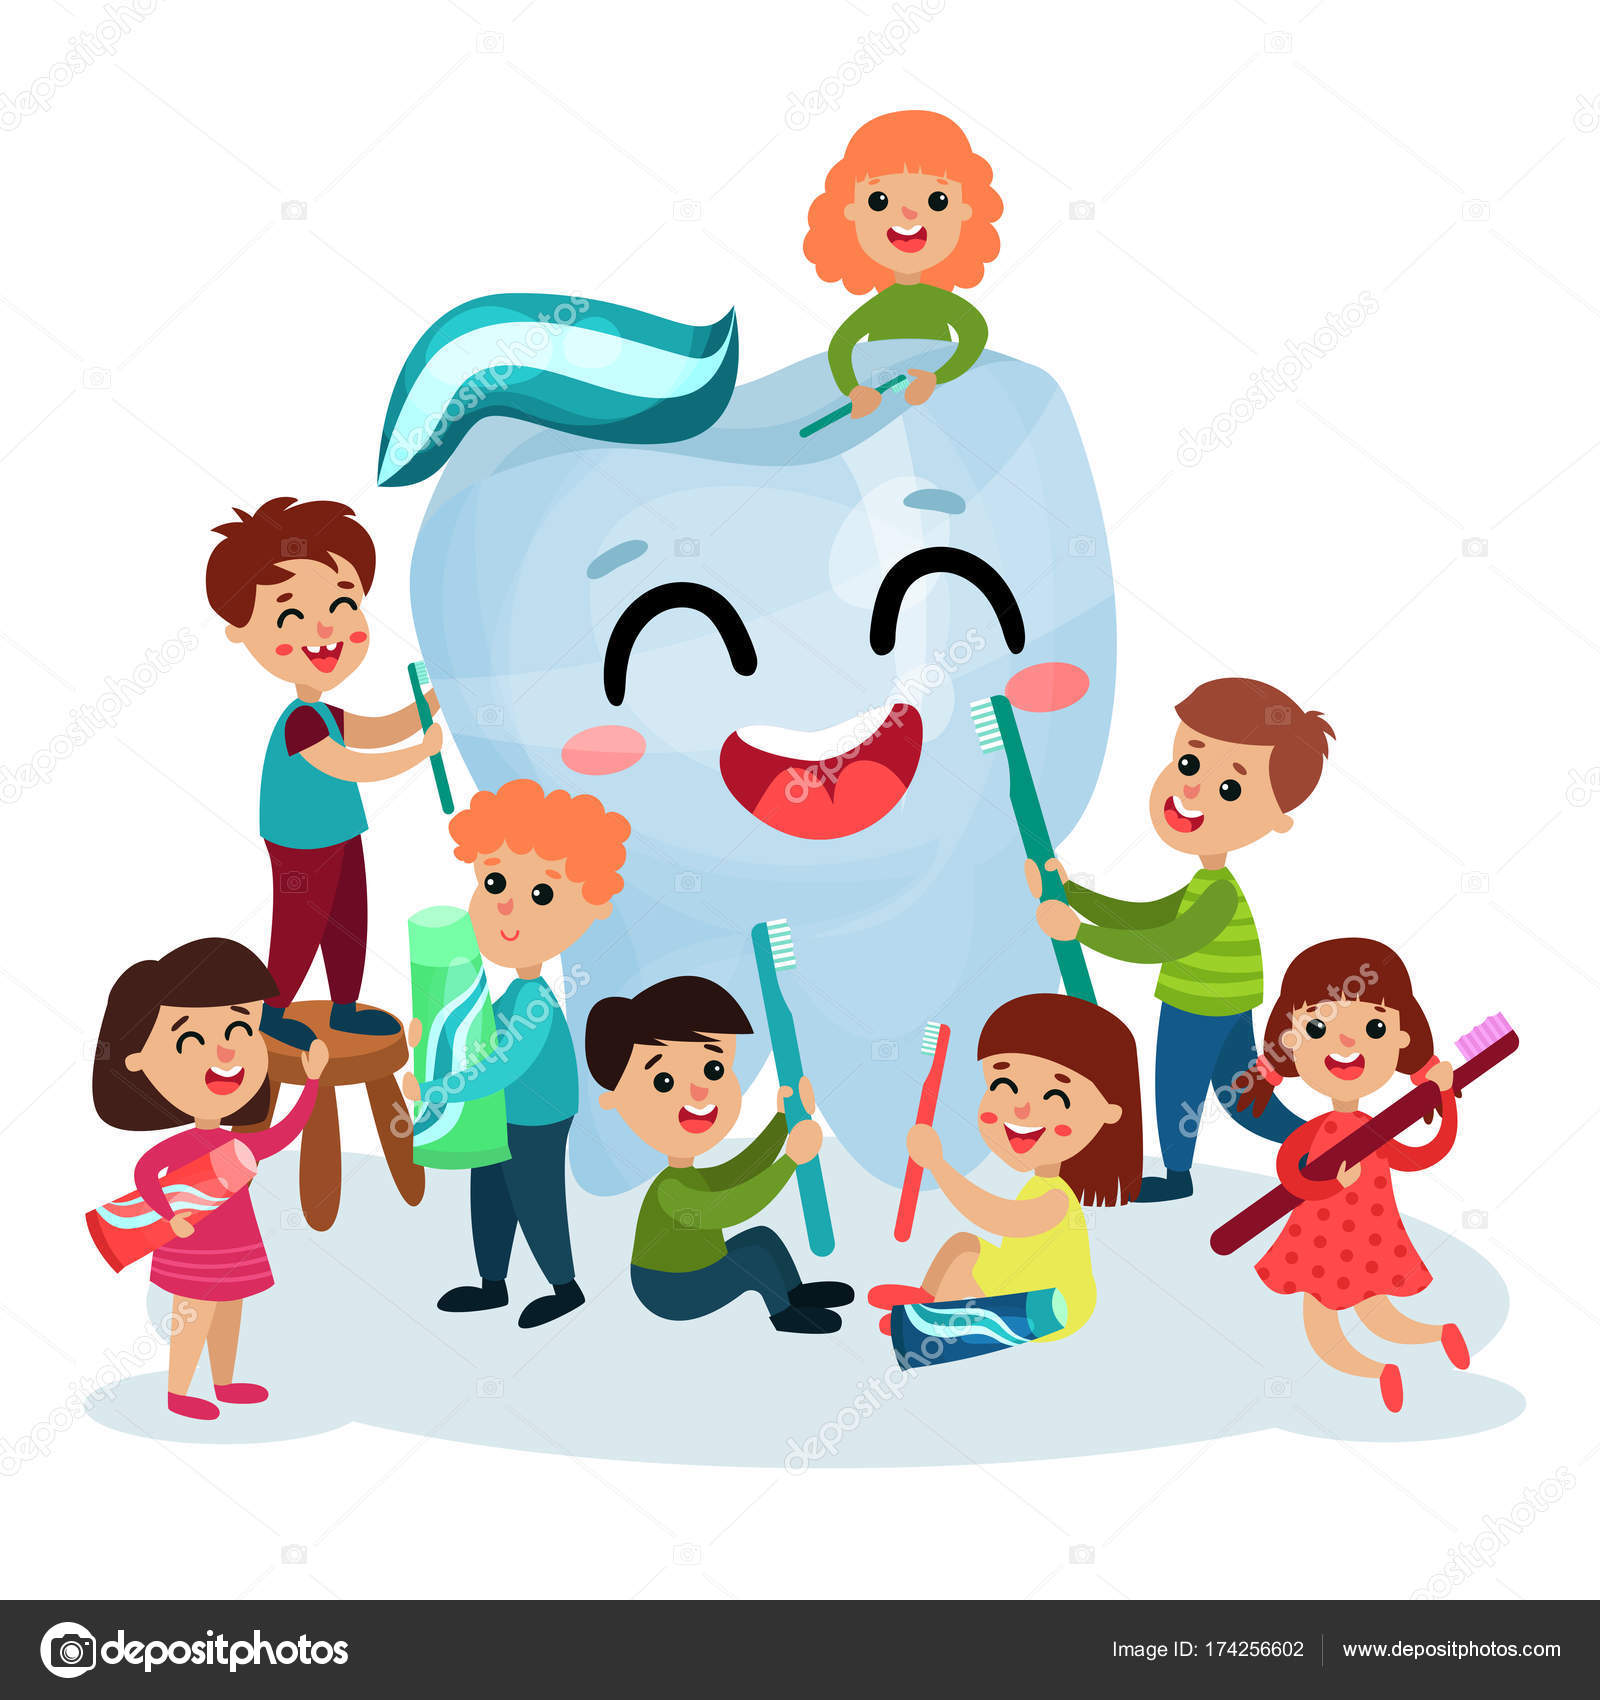 Concepto de salud bucal para ninos